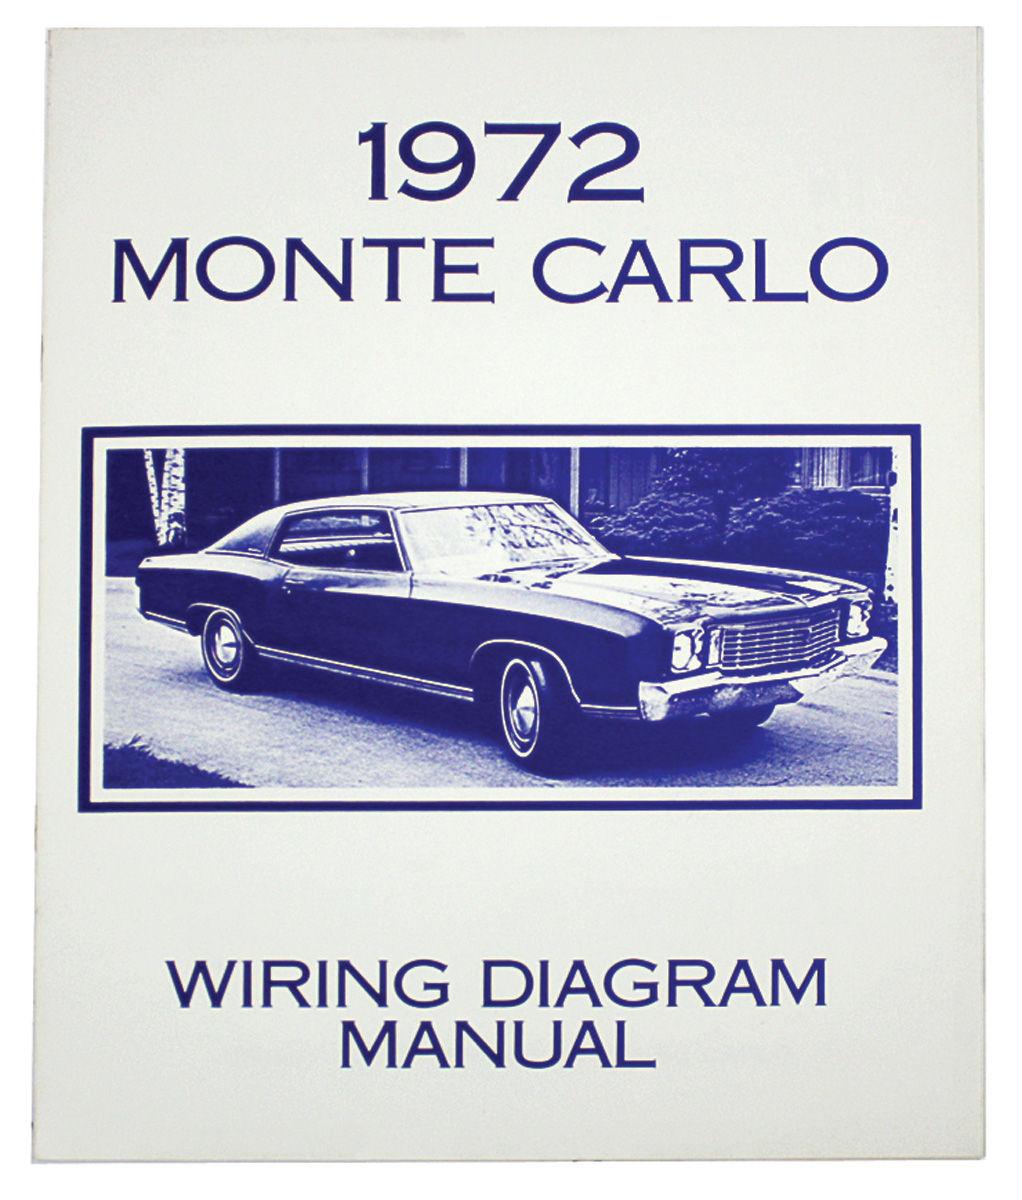 Wiring Diagram Manual  1971 Monte Carlo